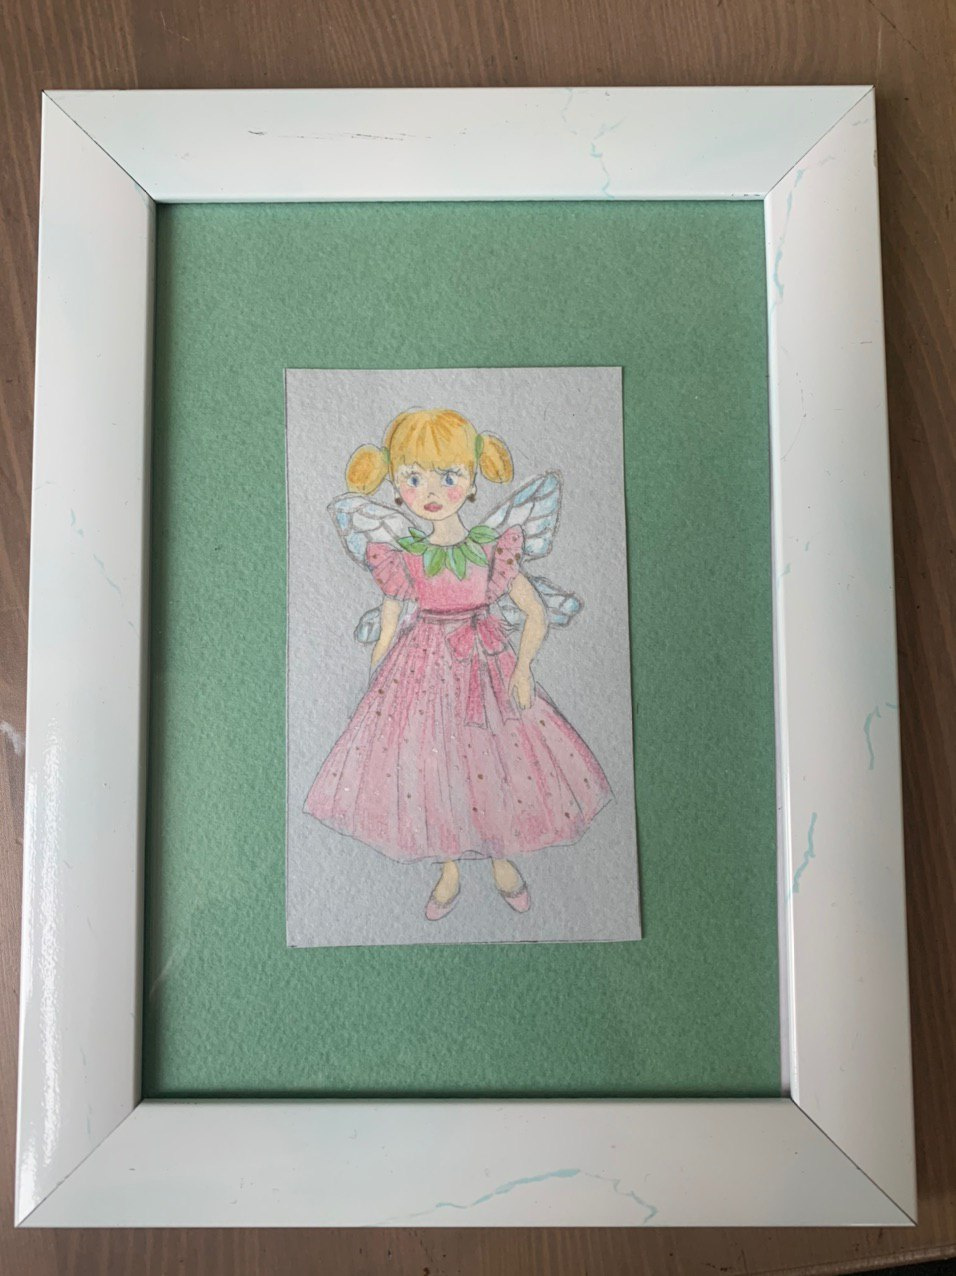 Lemberg Helen. Magic Fairy